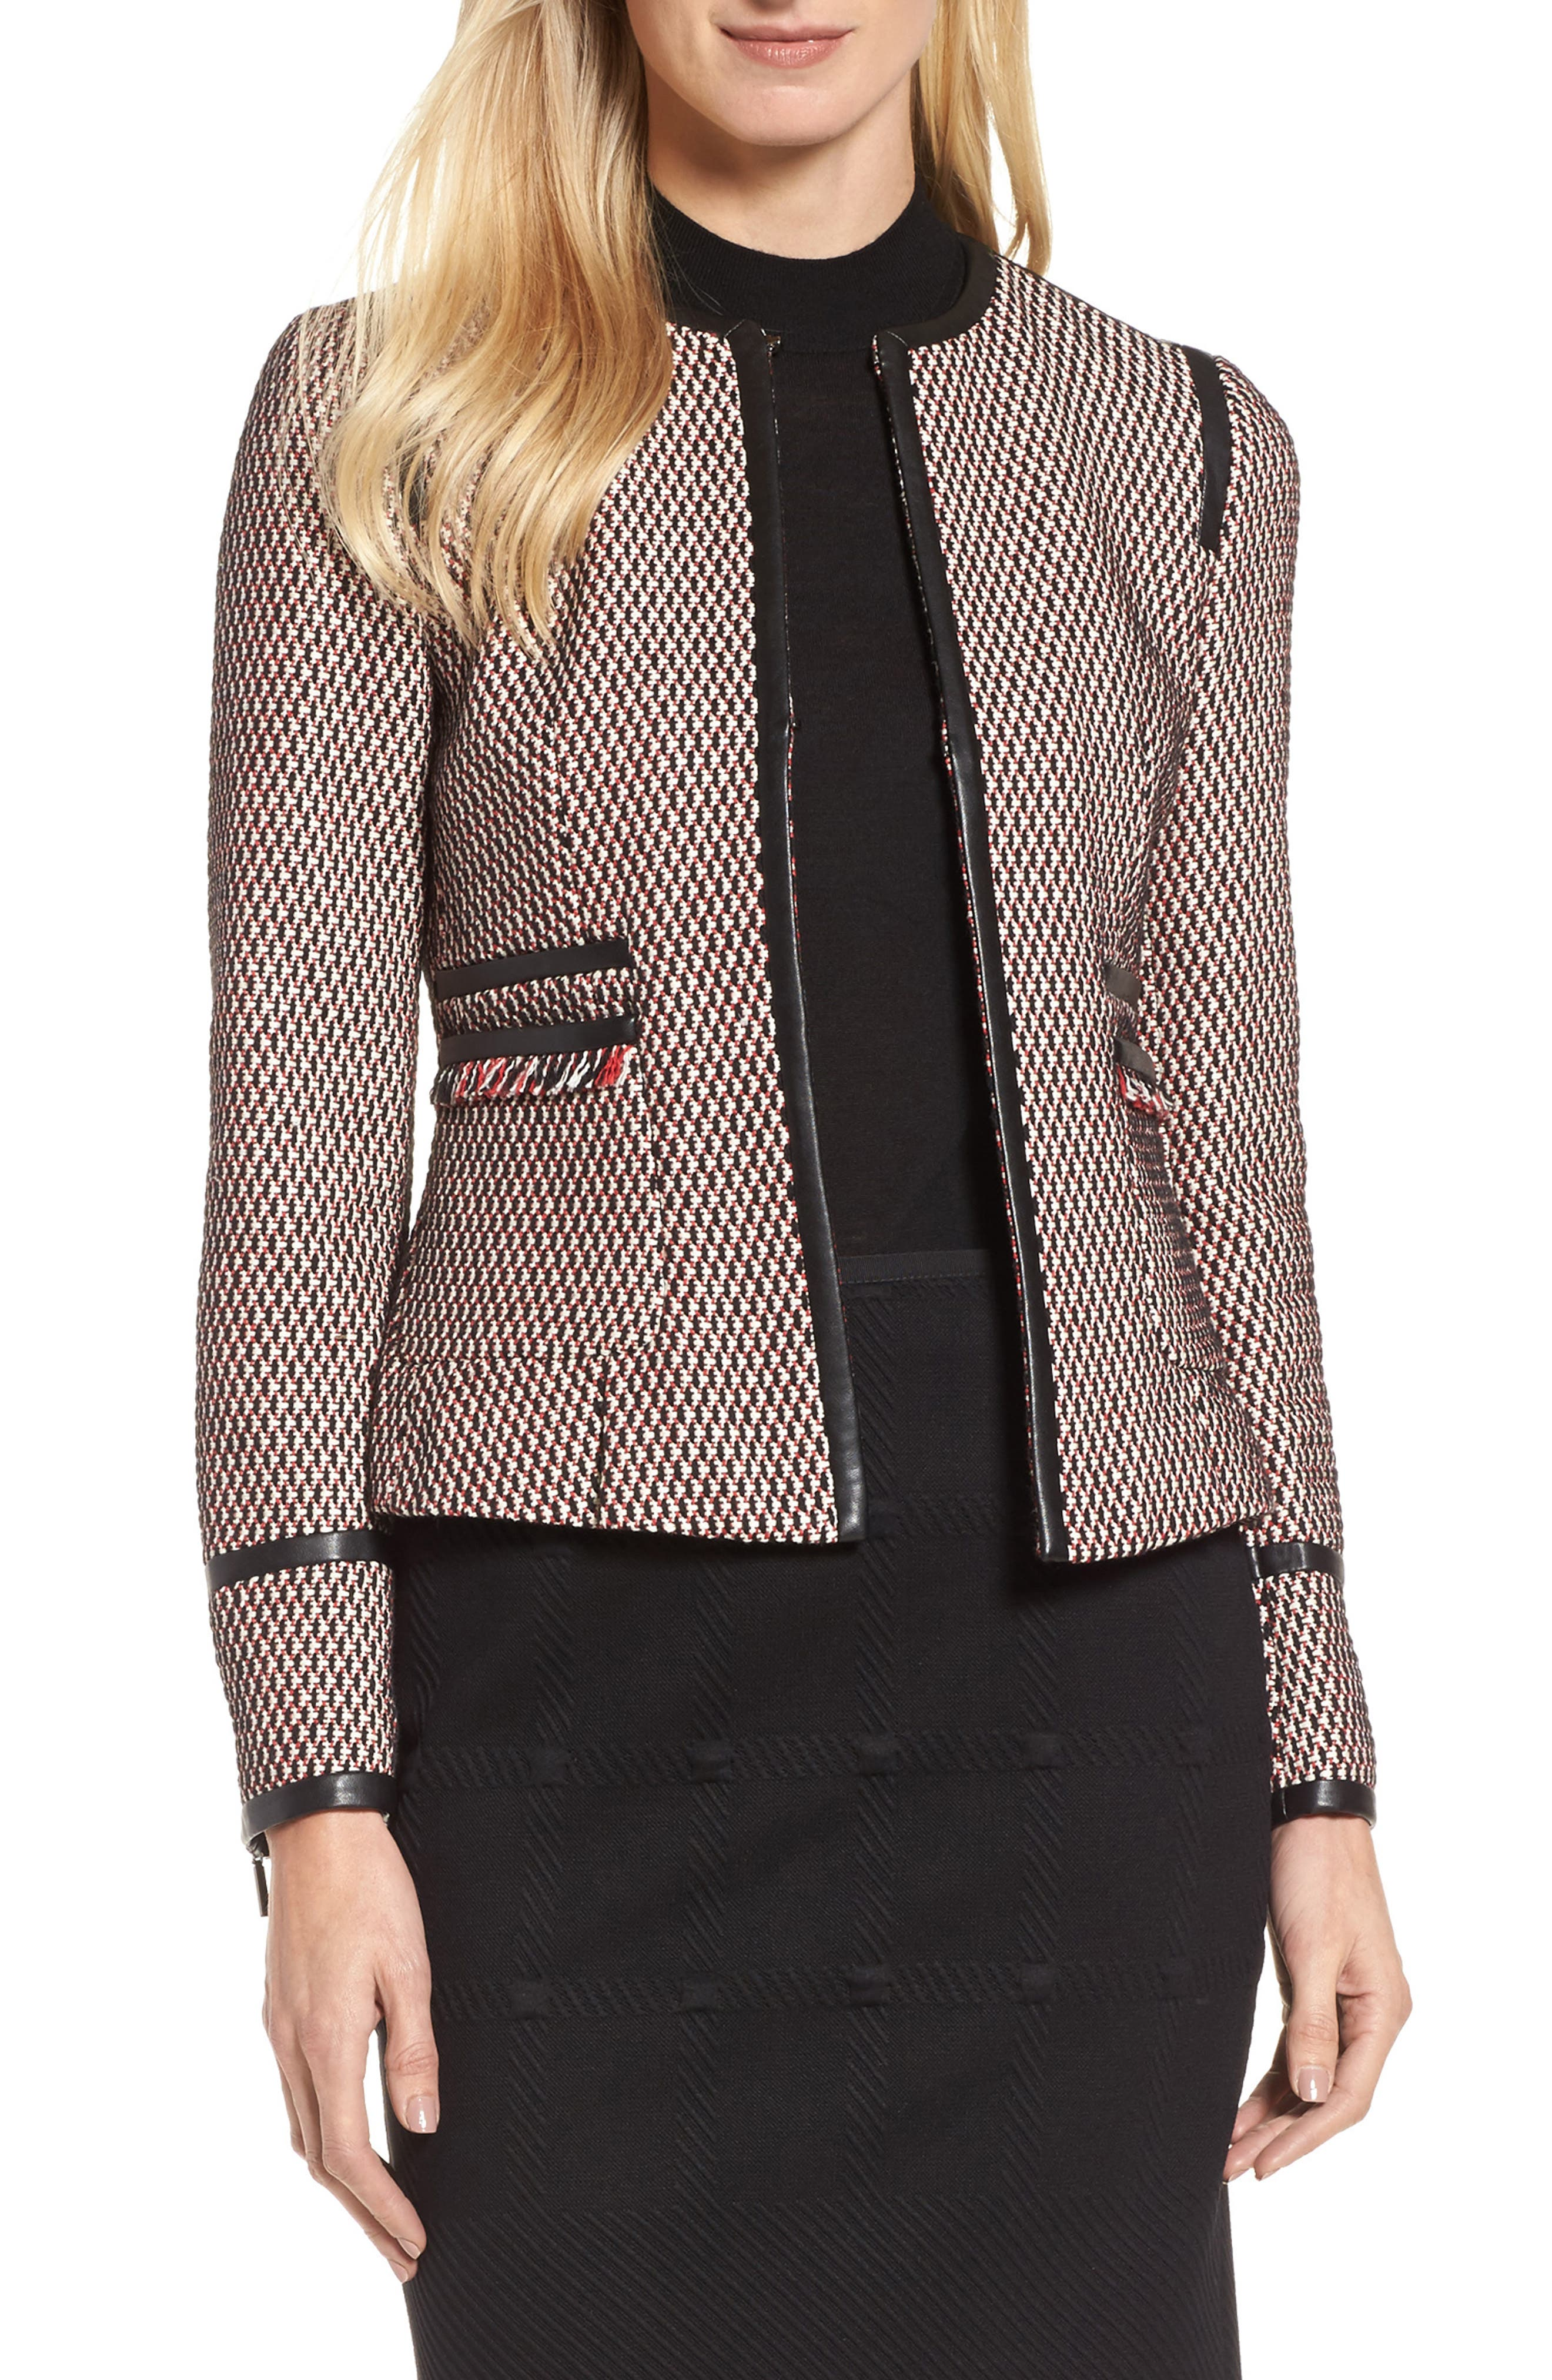 Keili Collarless Tweed Jacket,                         Main,                         color, 903